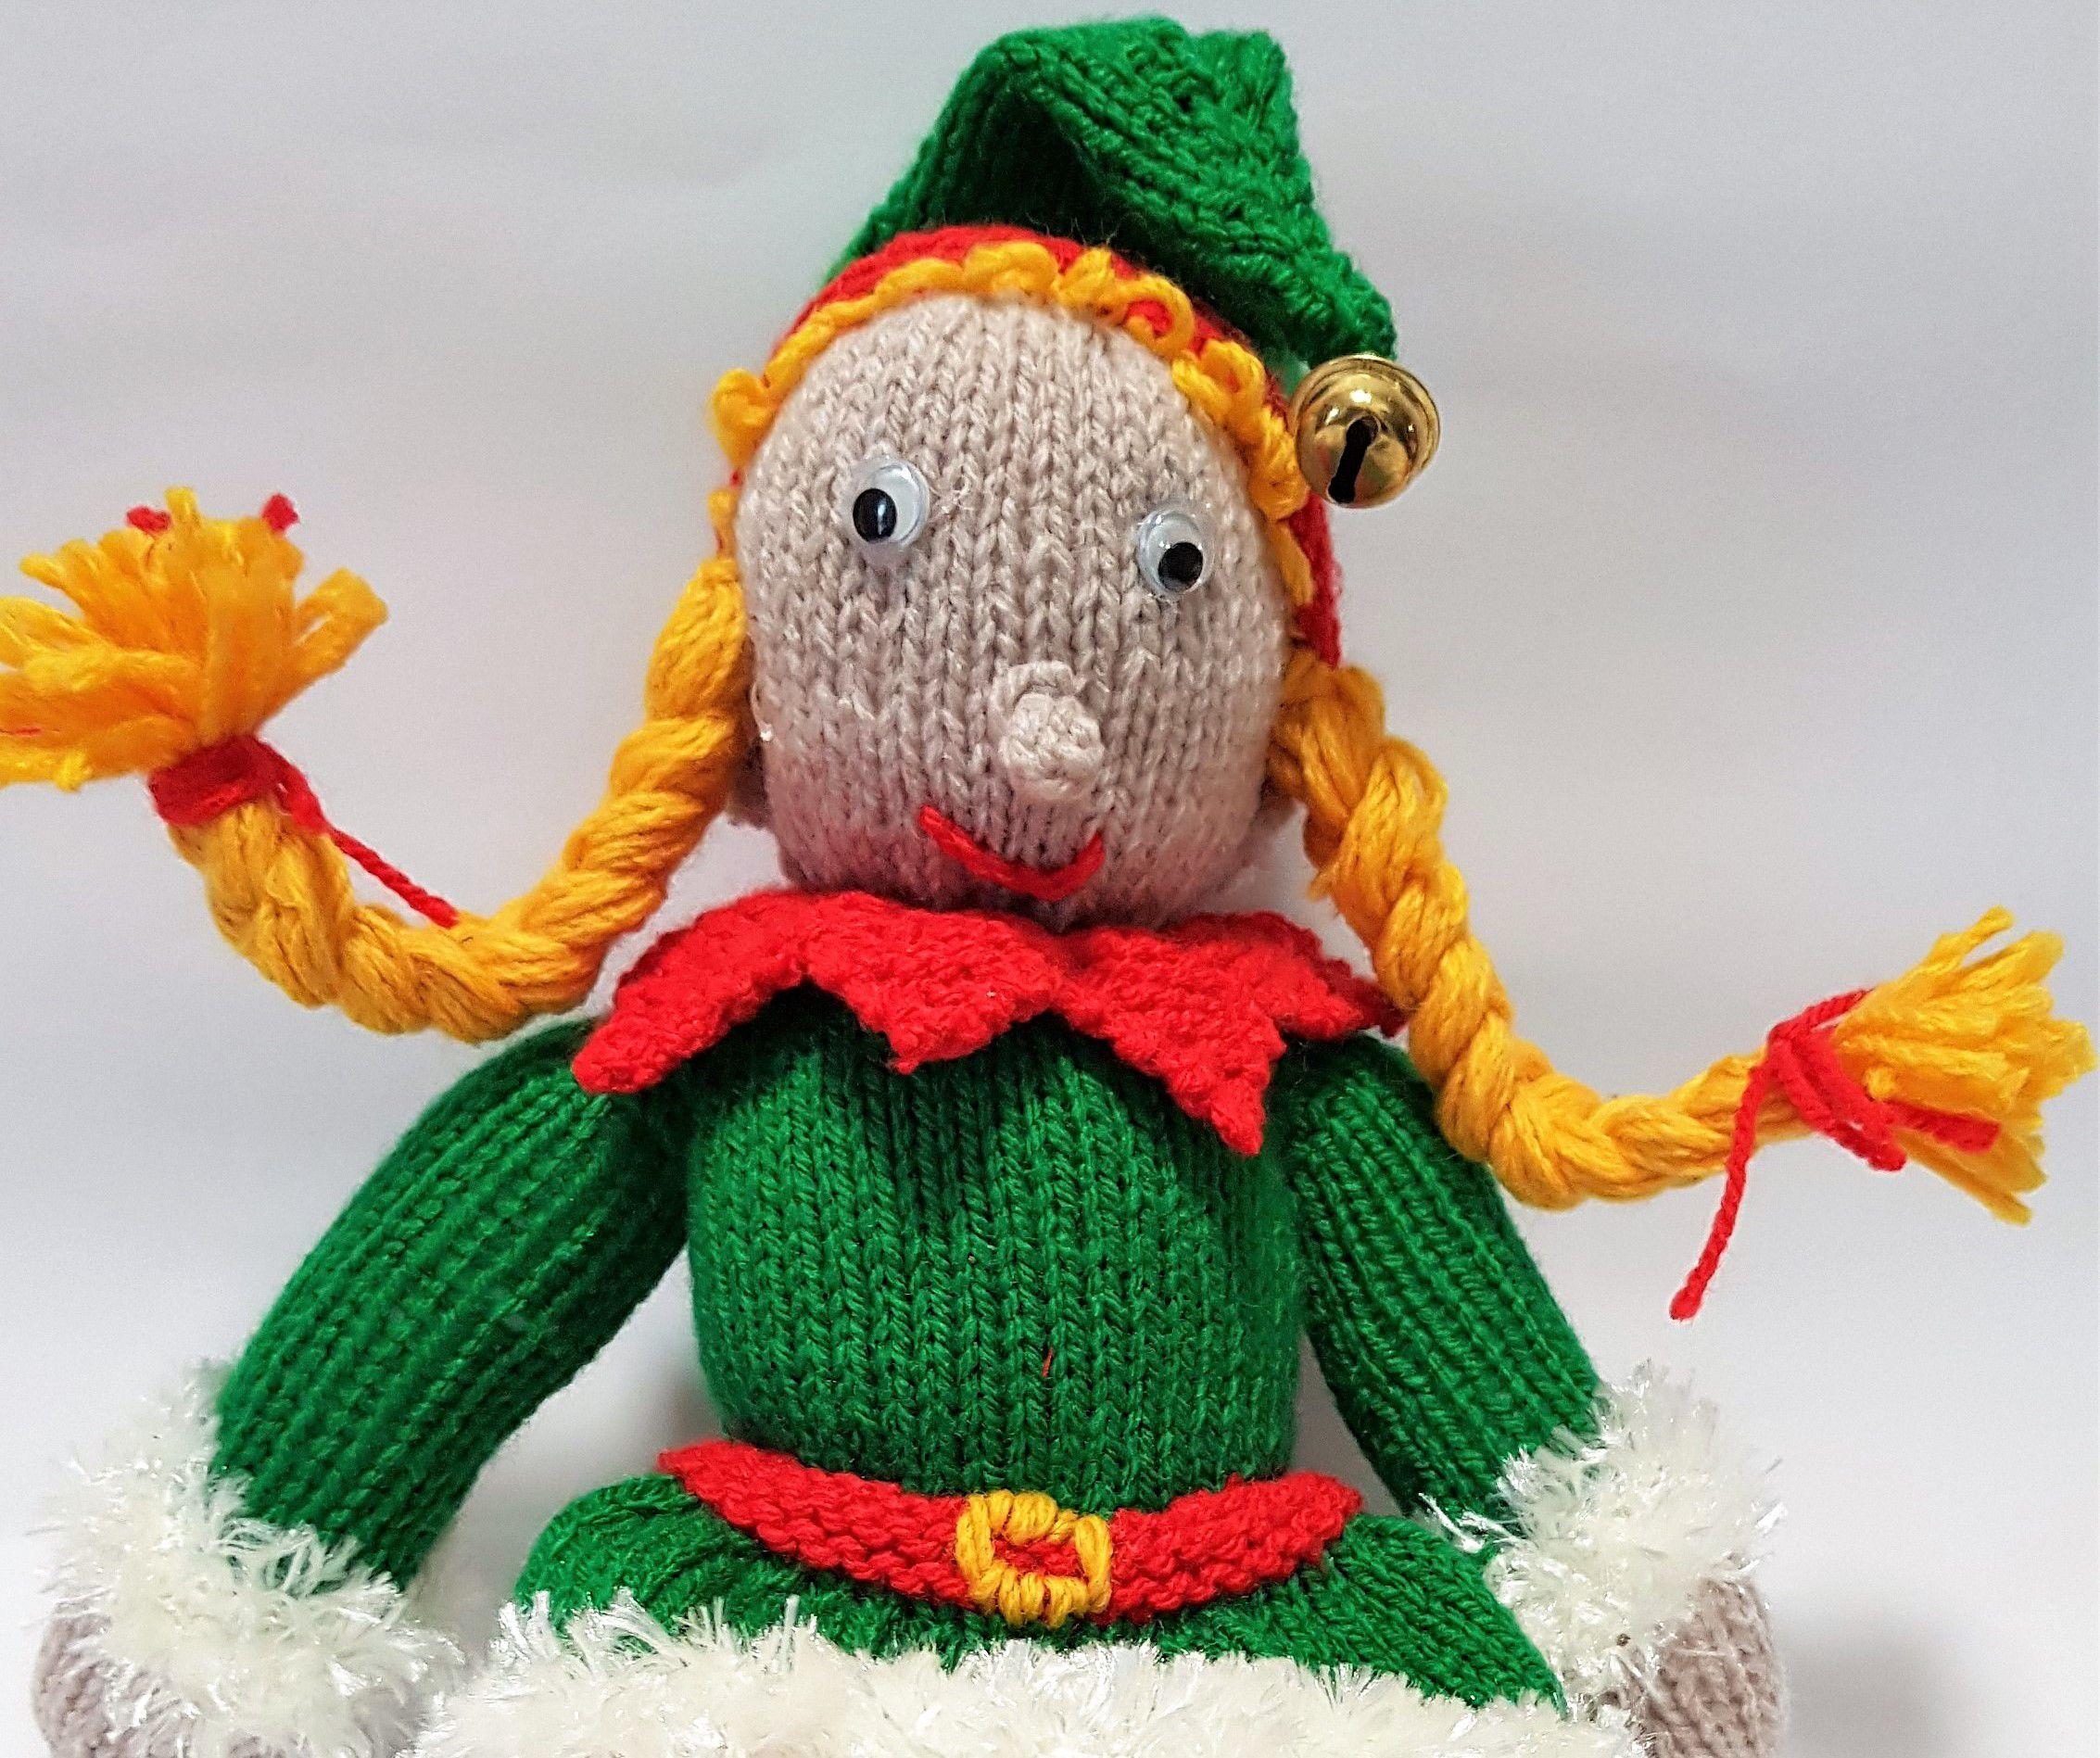 plushtoy stuffedtoy knittedelf santaself christmaself softtoy knittedtoy christmastoy elftoy